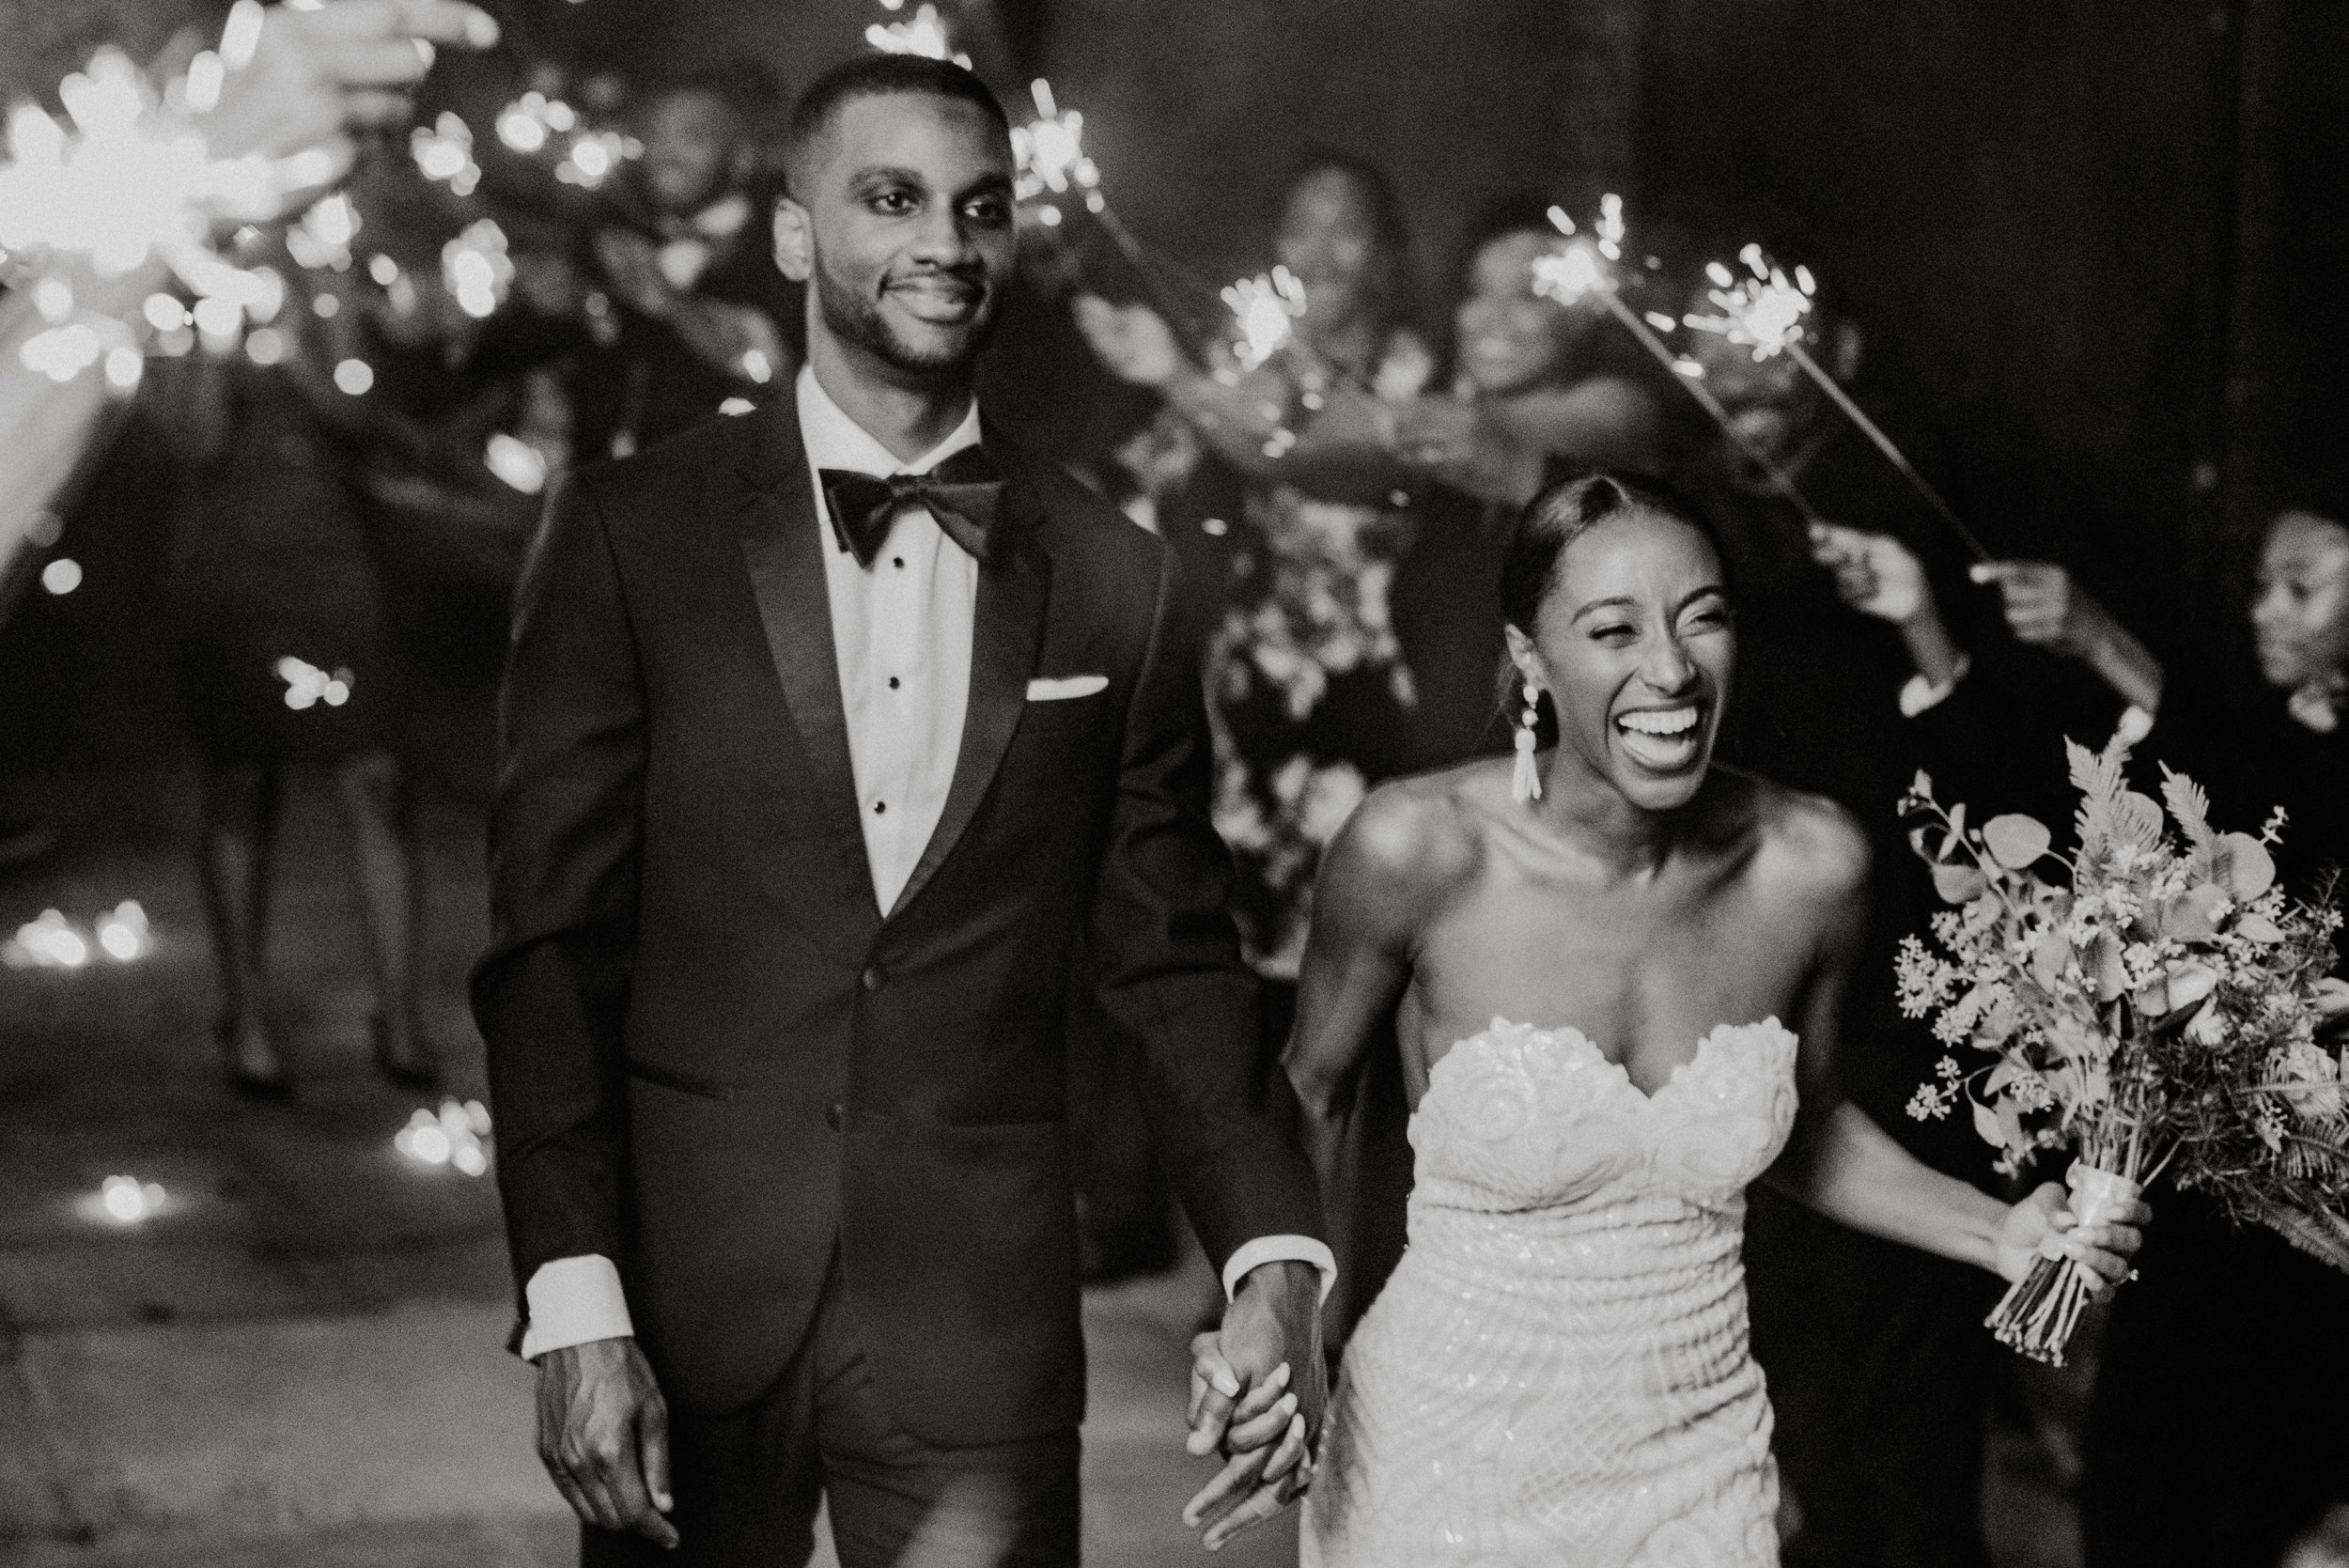 Greensboro Wedding - Sparkler Exit - Greensboro Wedding Photographer - Greensboro NC- NC Wedding -NC Wedding Photographer - The Lofts at Union Square Wedding Venue -1720.jpg